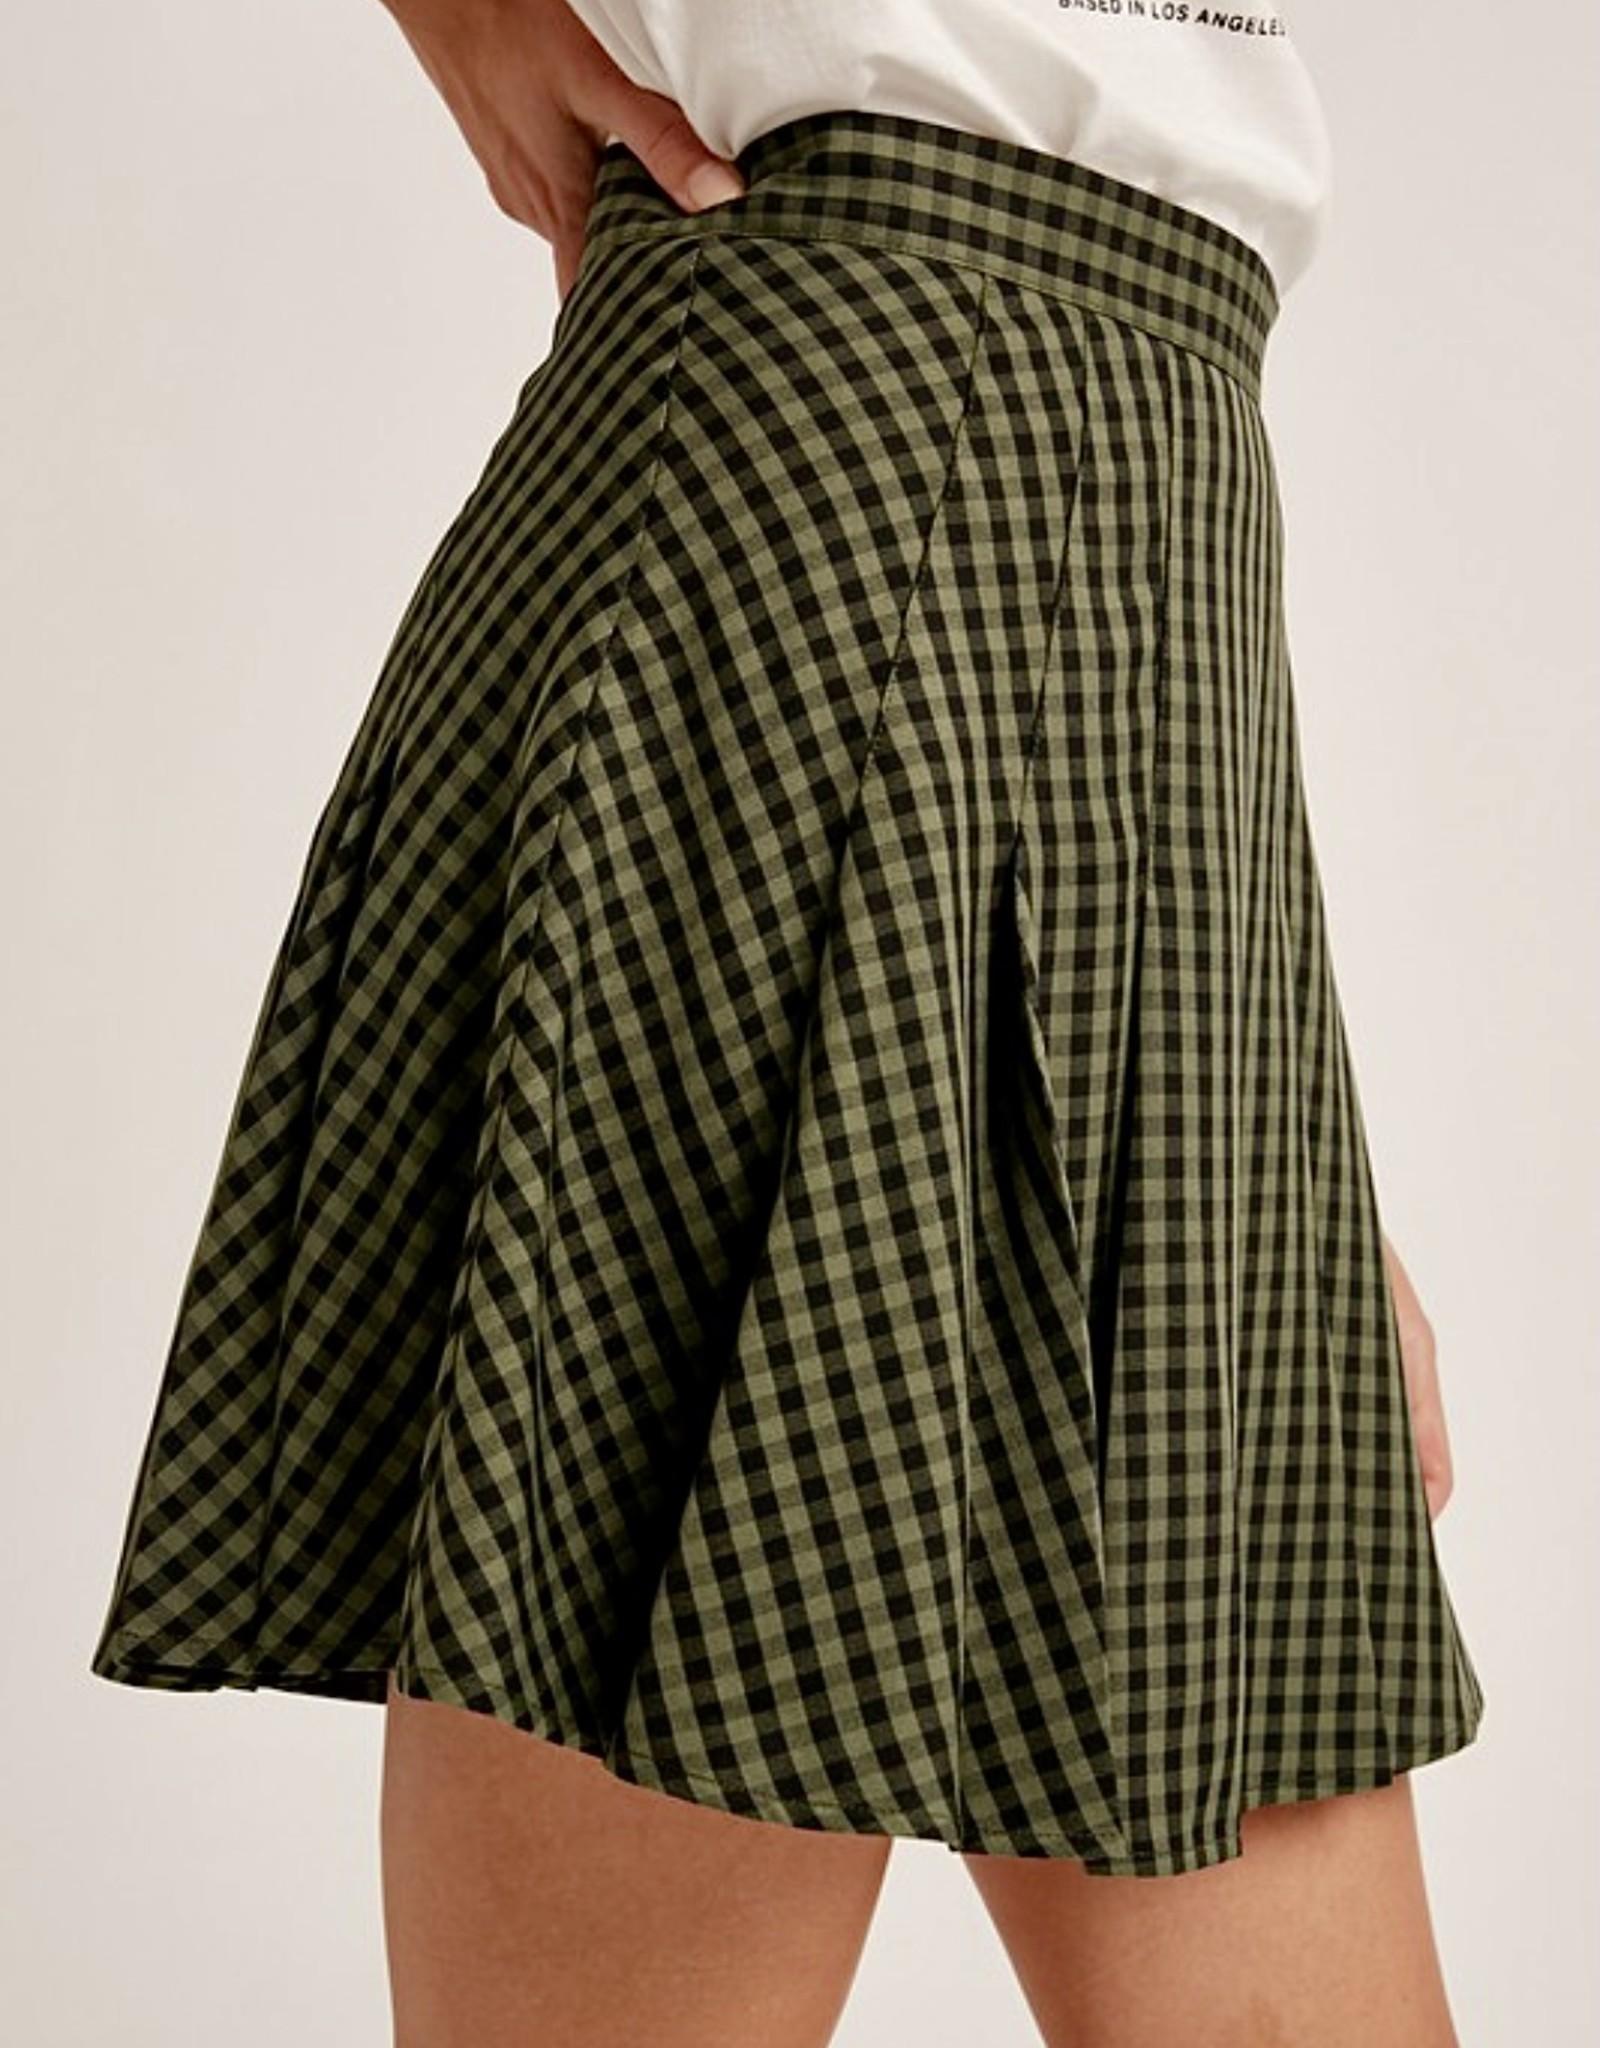 HUSH WILLA mini skirt